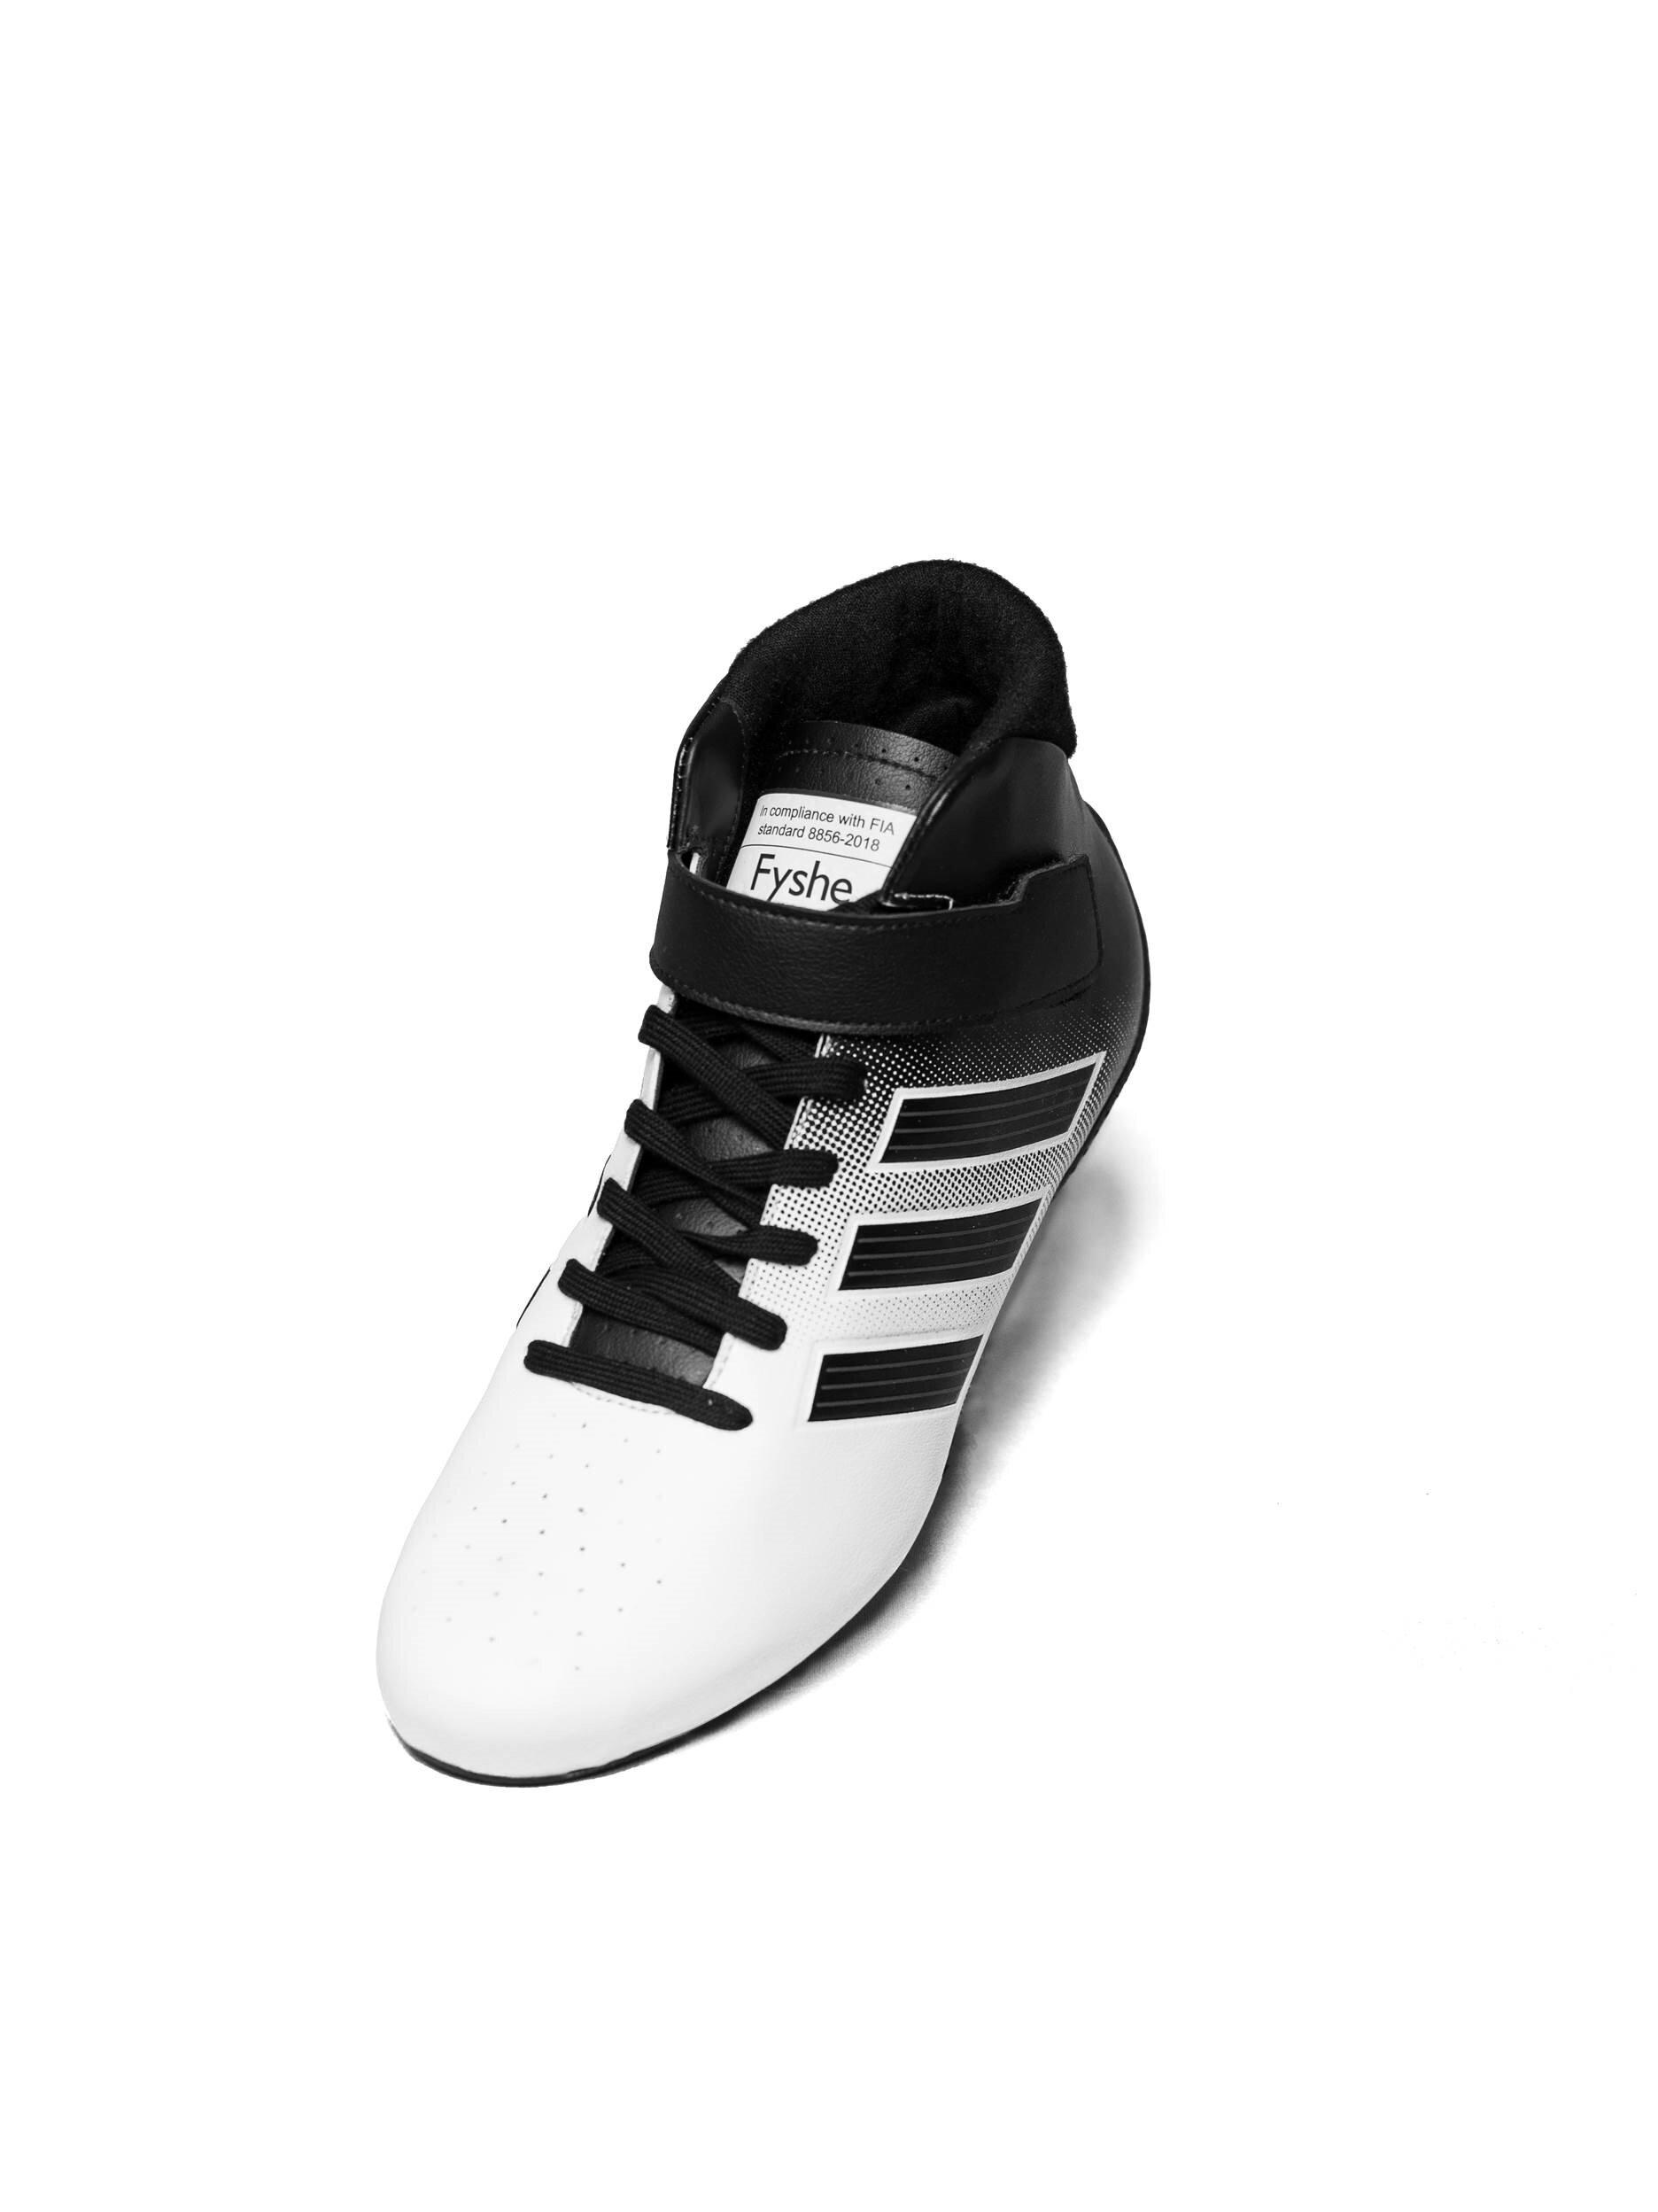 Adidas raceschoen type RS wit zwart FIA homologatie